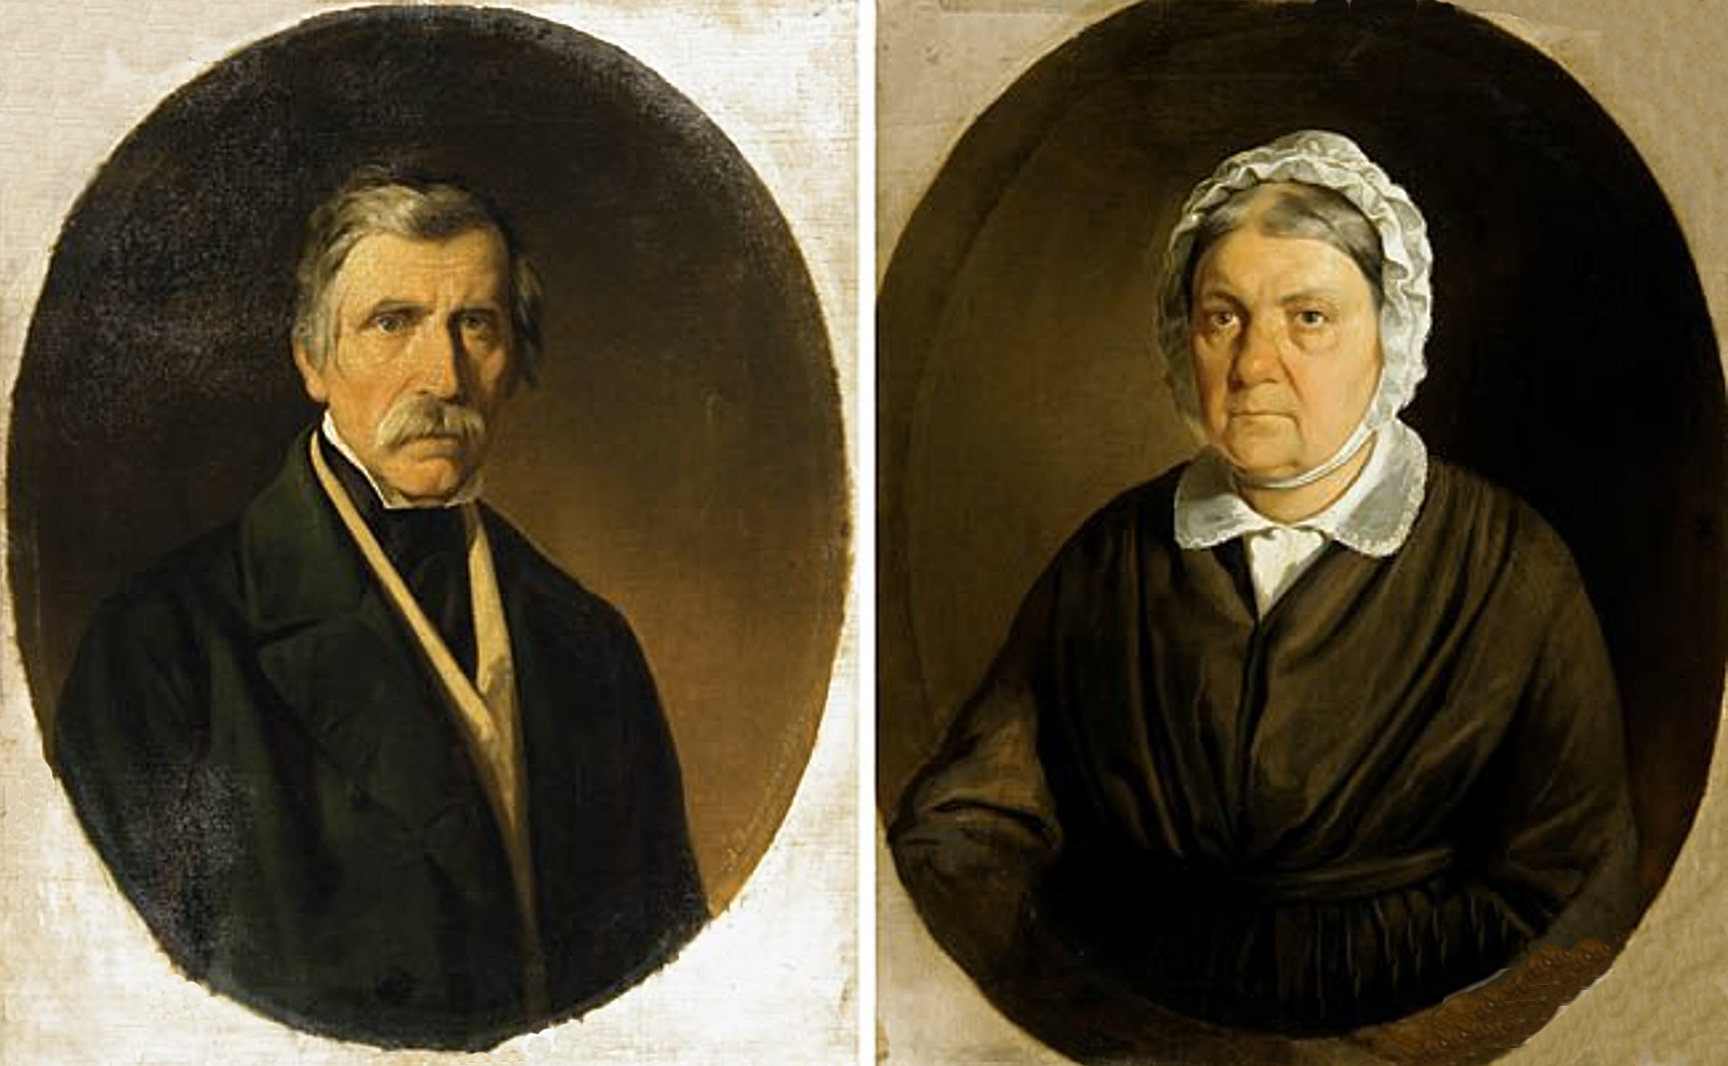 Александер Рачинський. Портрет подружжя, 1852; олія, полотно